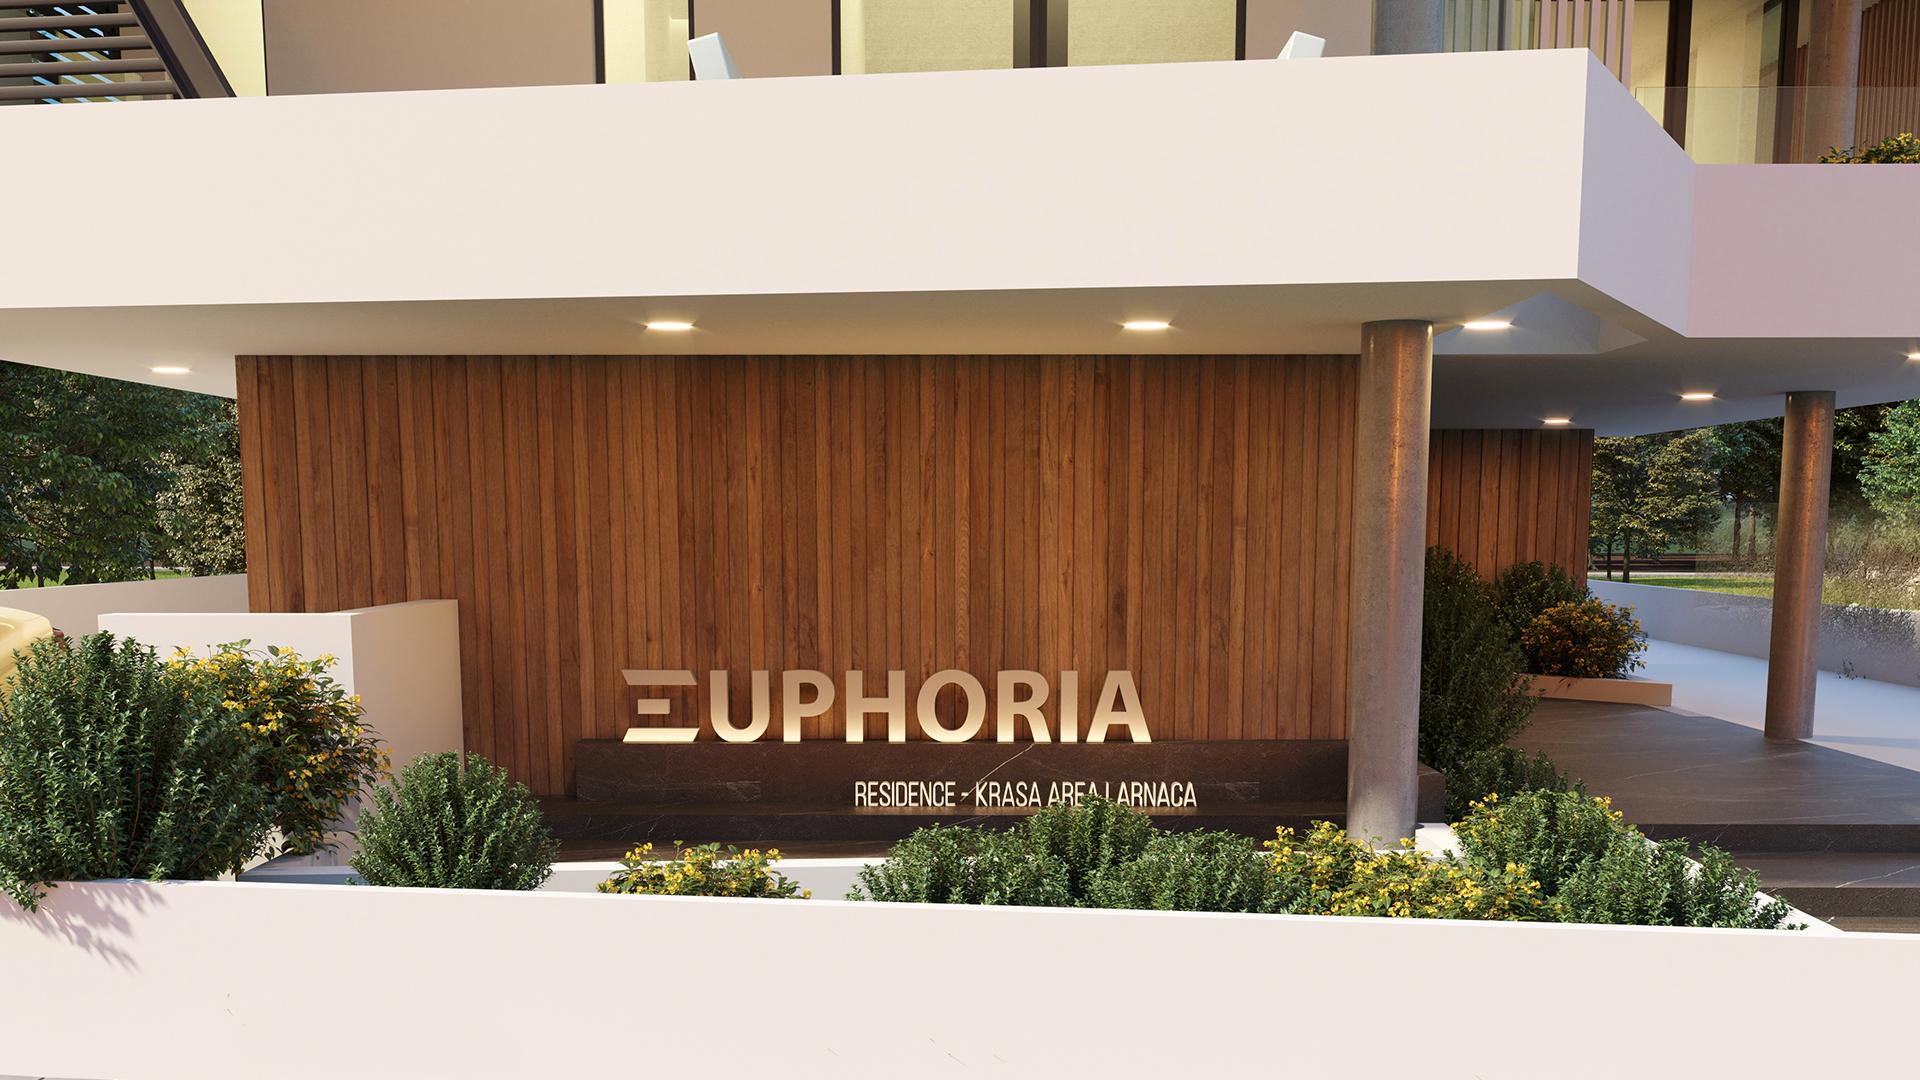 """Euphoria Residence"": Το νέο έργο της INFINITY στην περιοχή Κρασά στη Λάρνακα"